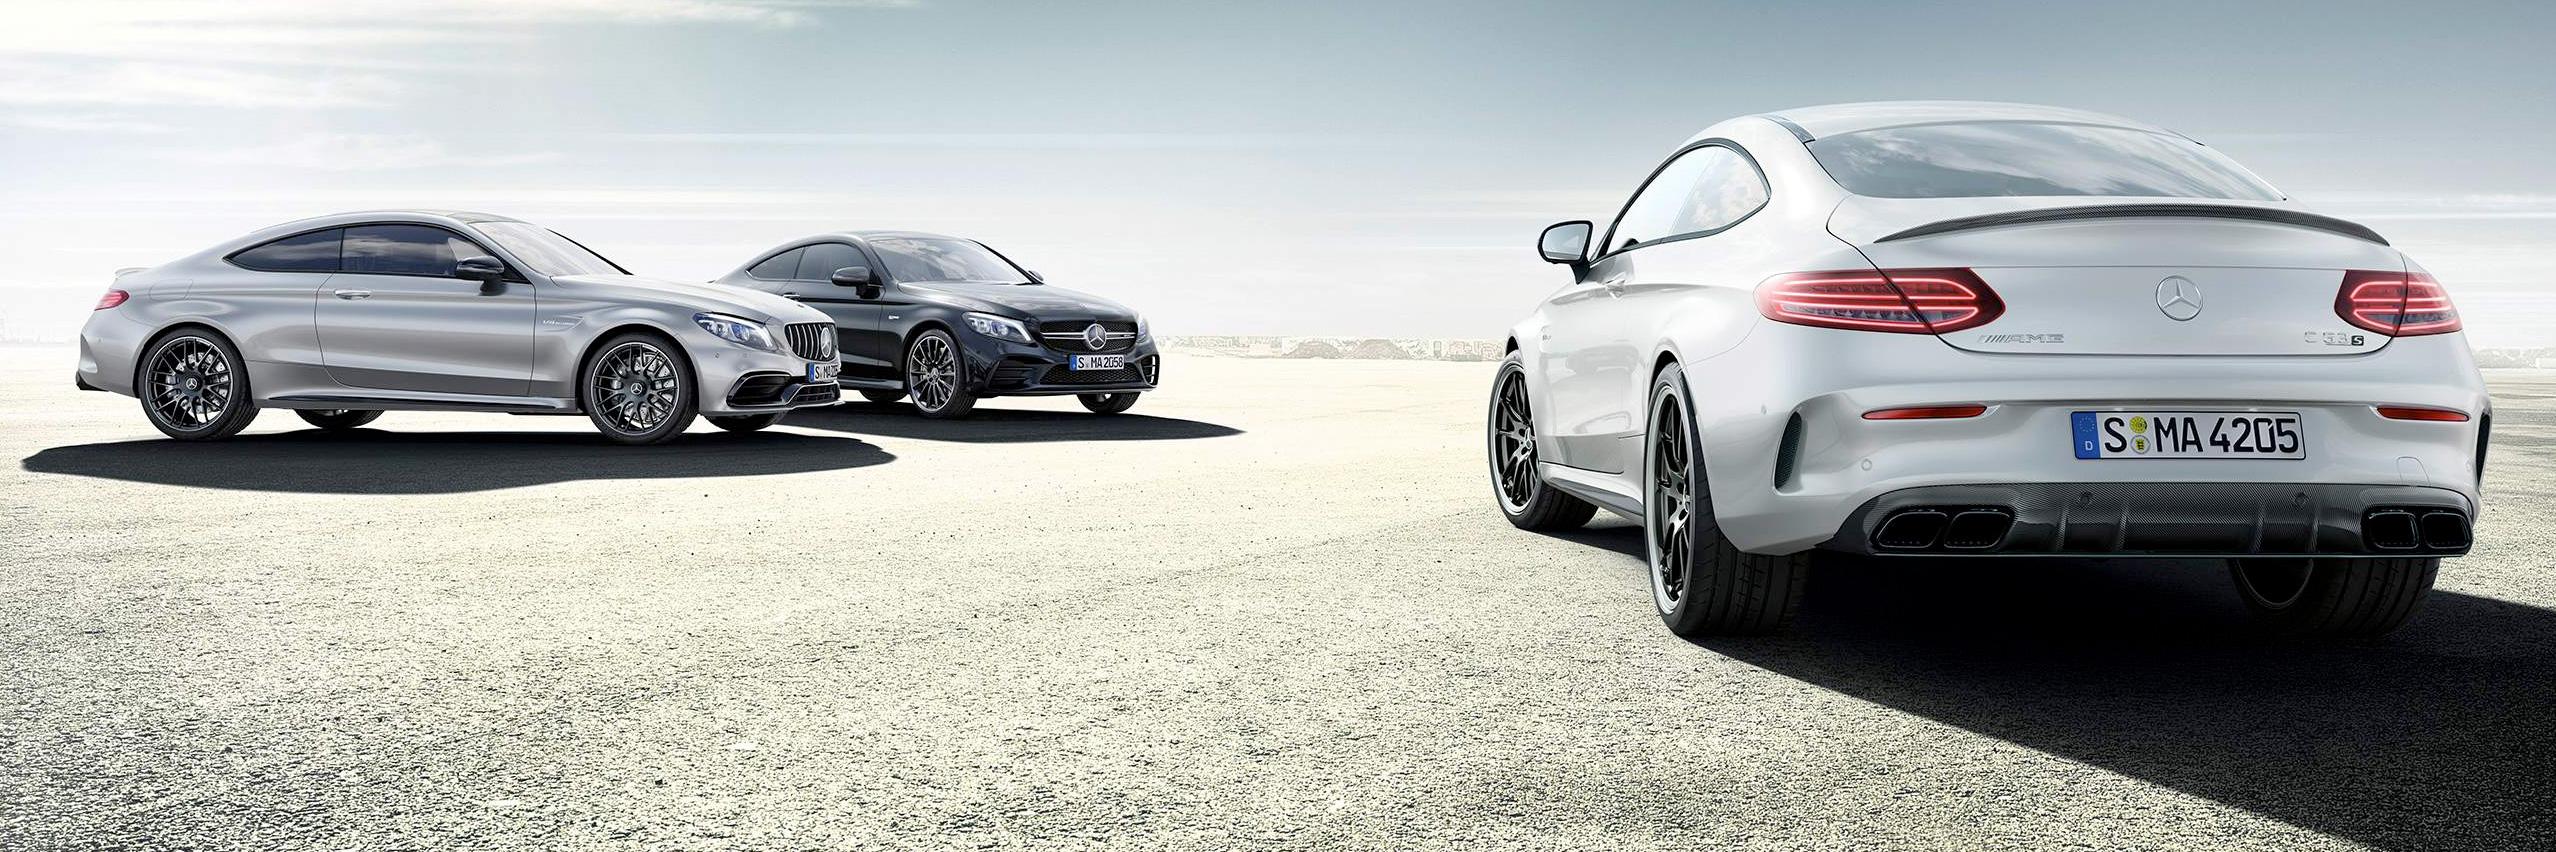 CAR-Avenue-Mercedes-AMG-Classe-C-Coupe-06